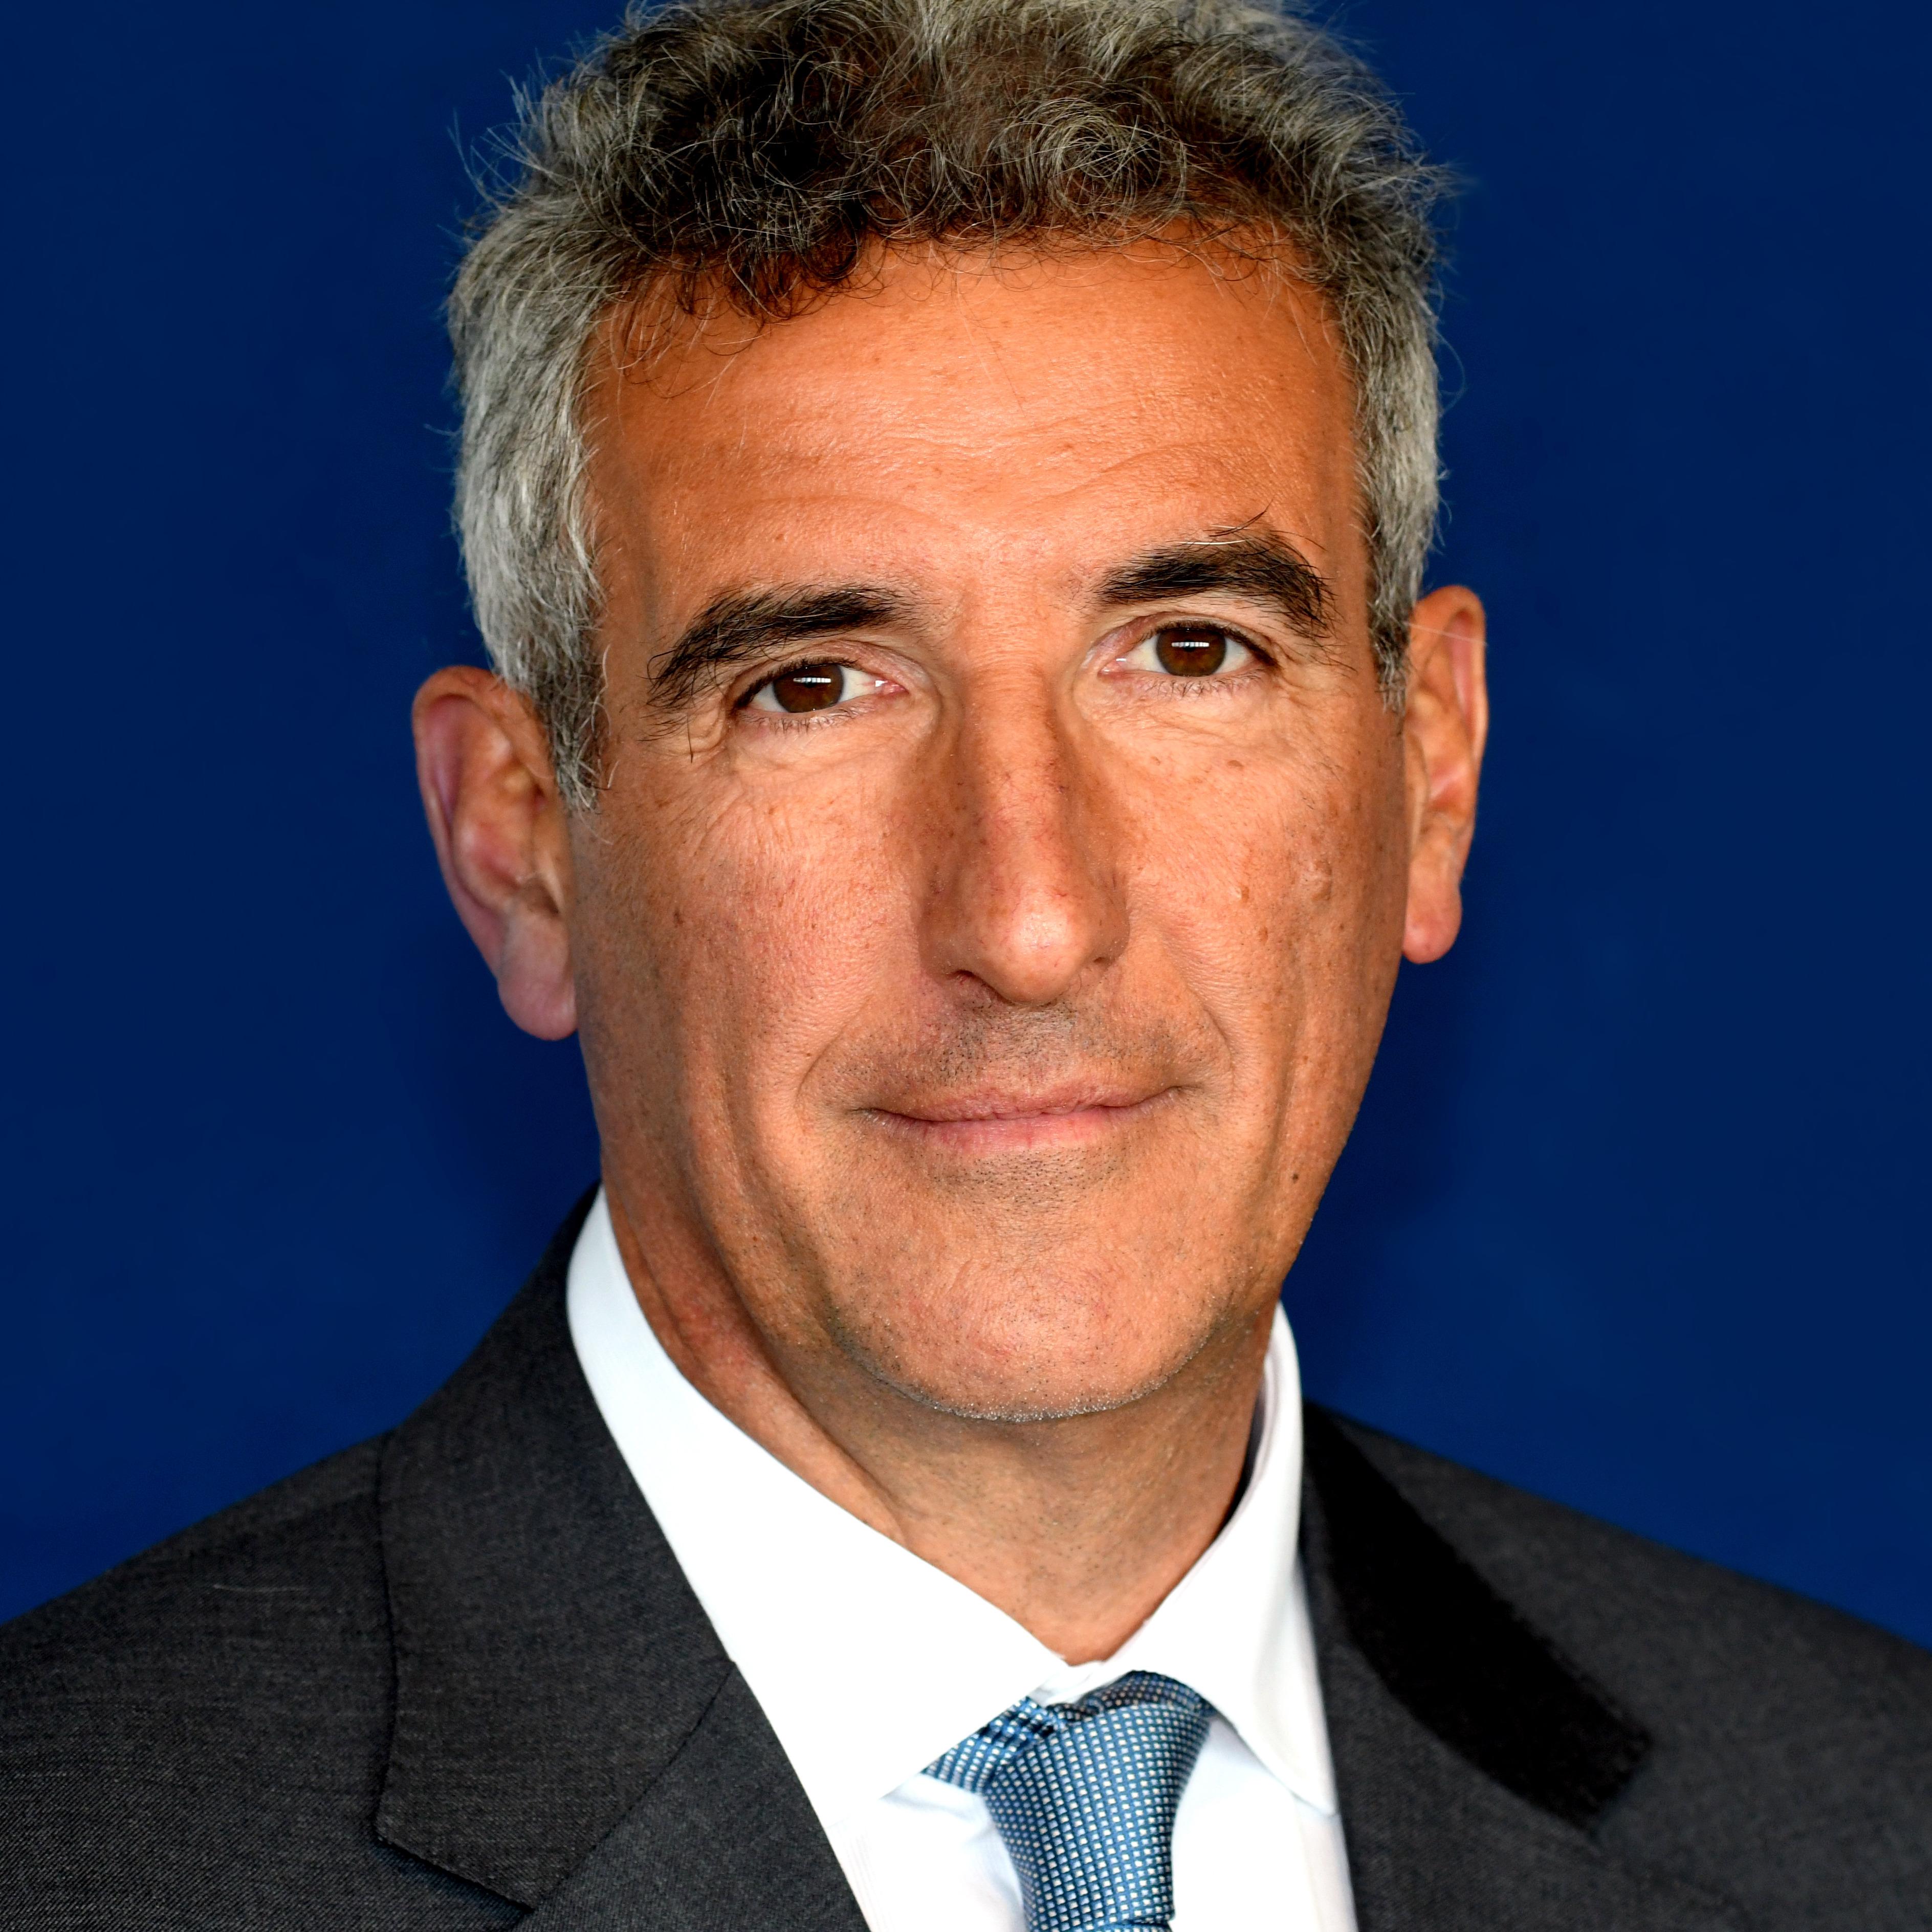 Franco Ongaro - Director of TEC